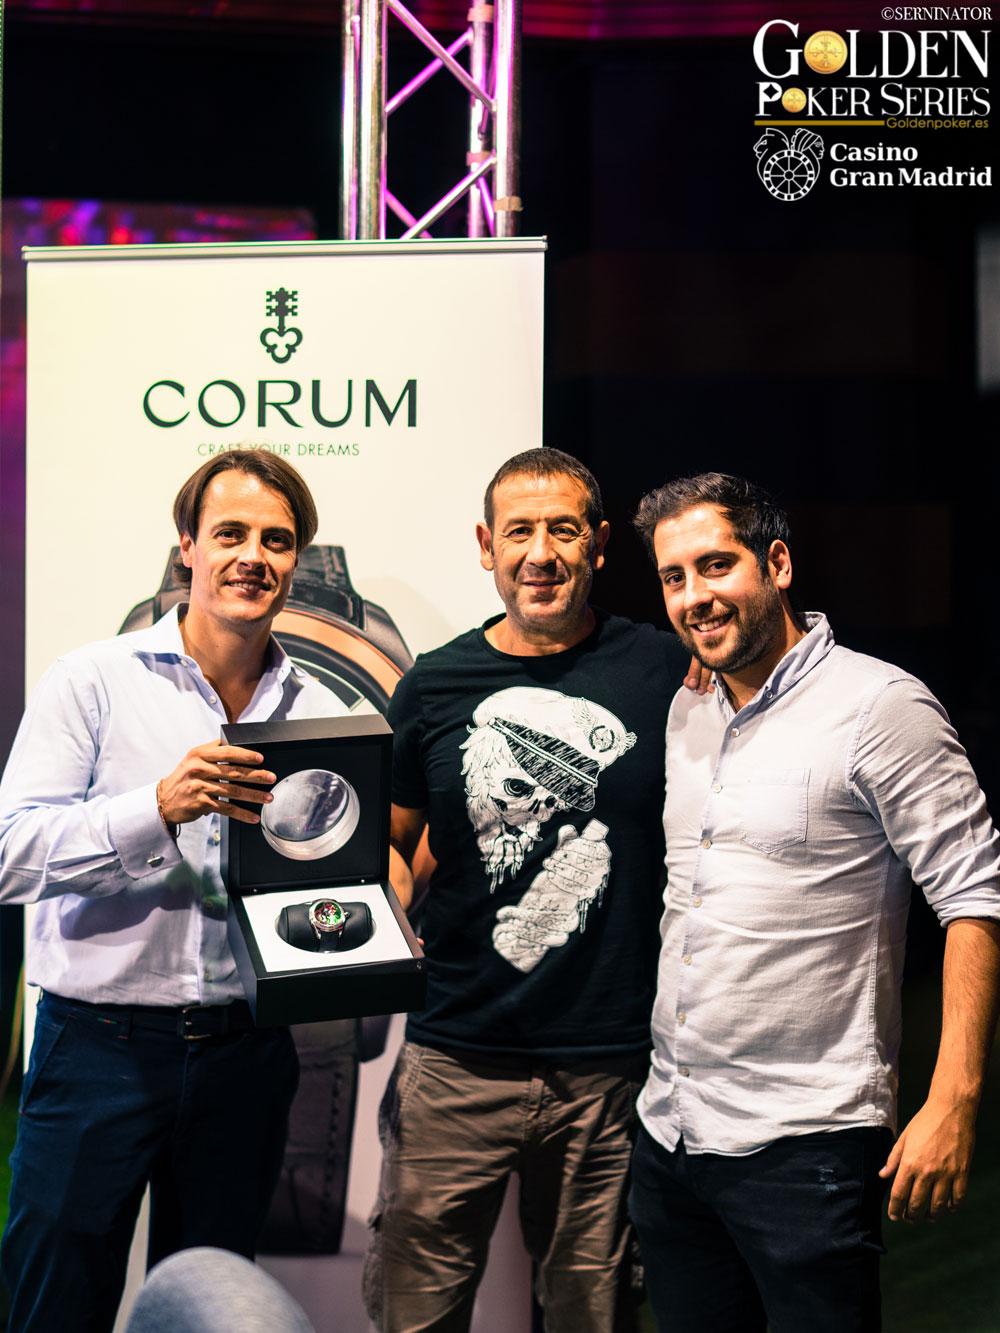 Daniel Nicols, vicepresidente Grupo Nicol's; Juan Manuel Pastor, tercer ganador Poker Golden Series Casino Madrid y Fernado Heredia, organizador del circuito de póker